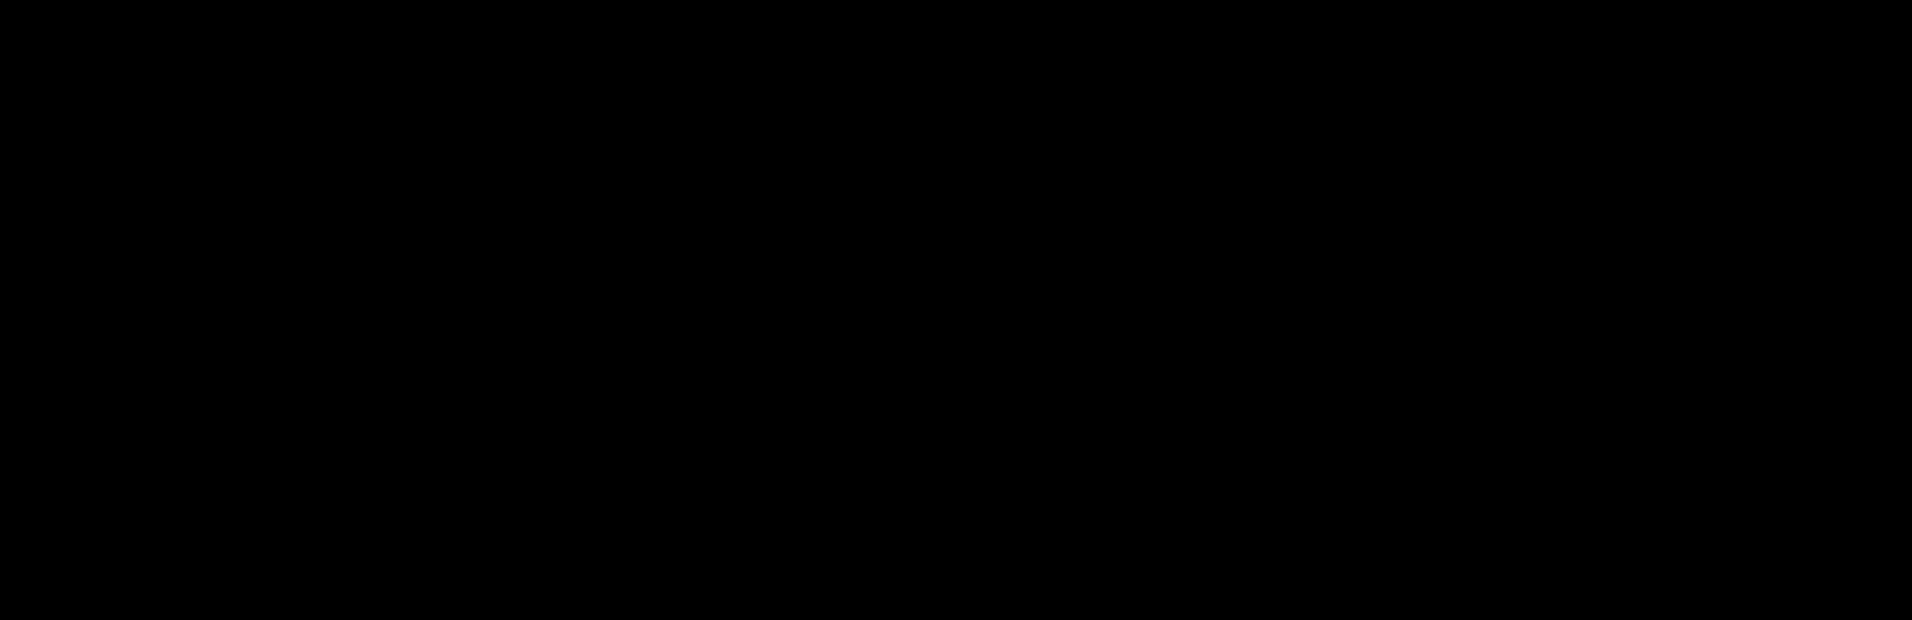 black rectangle web.png